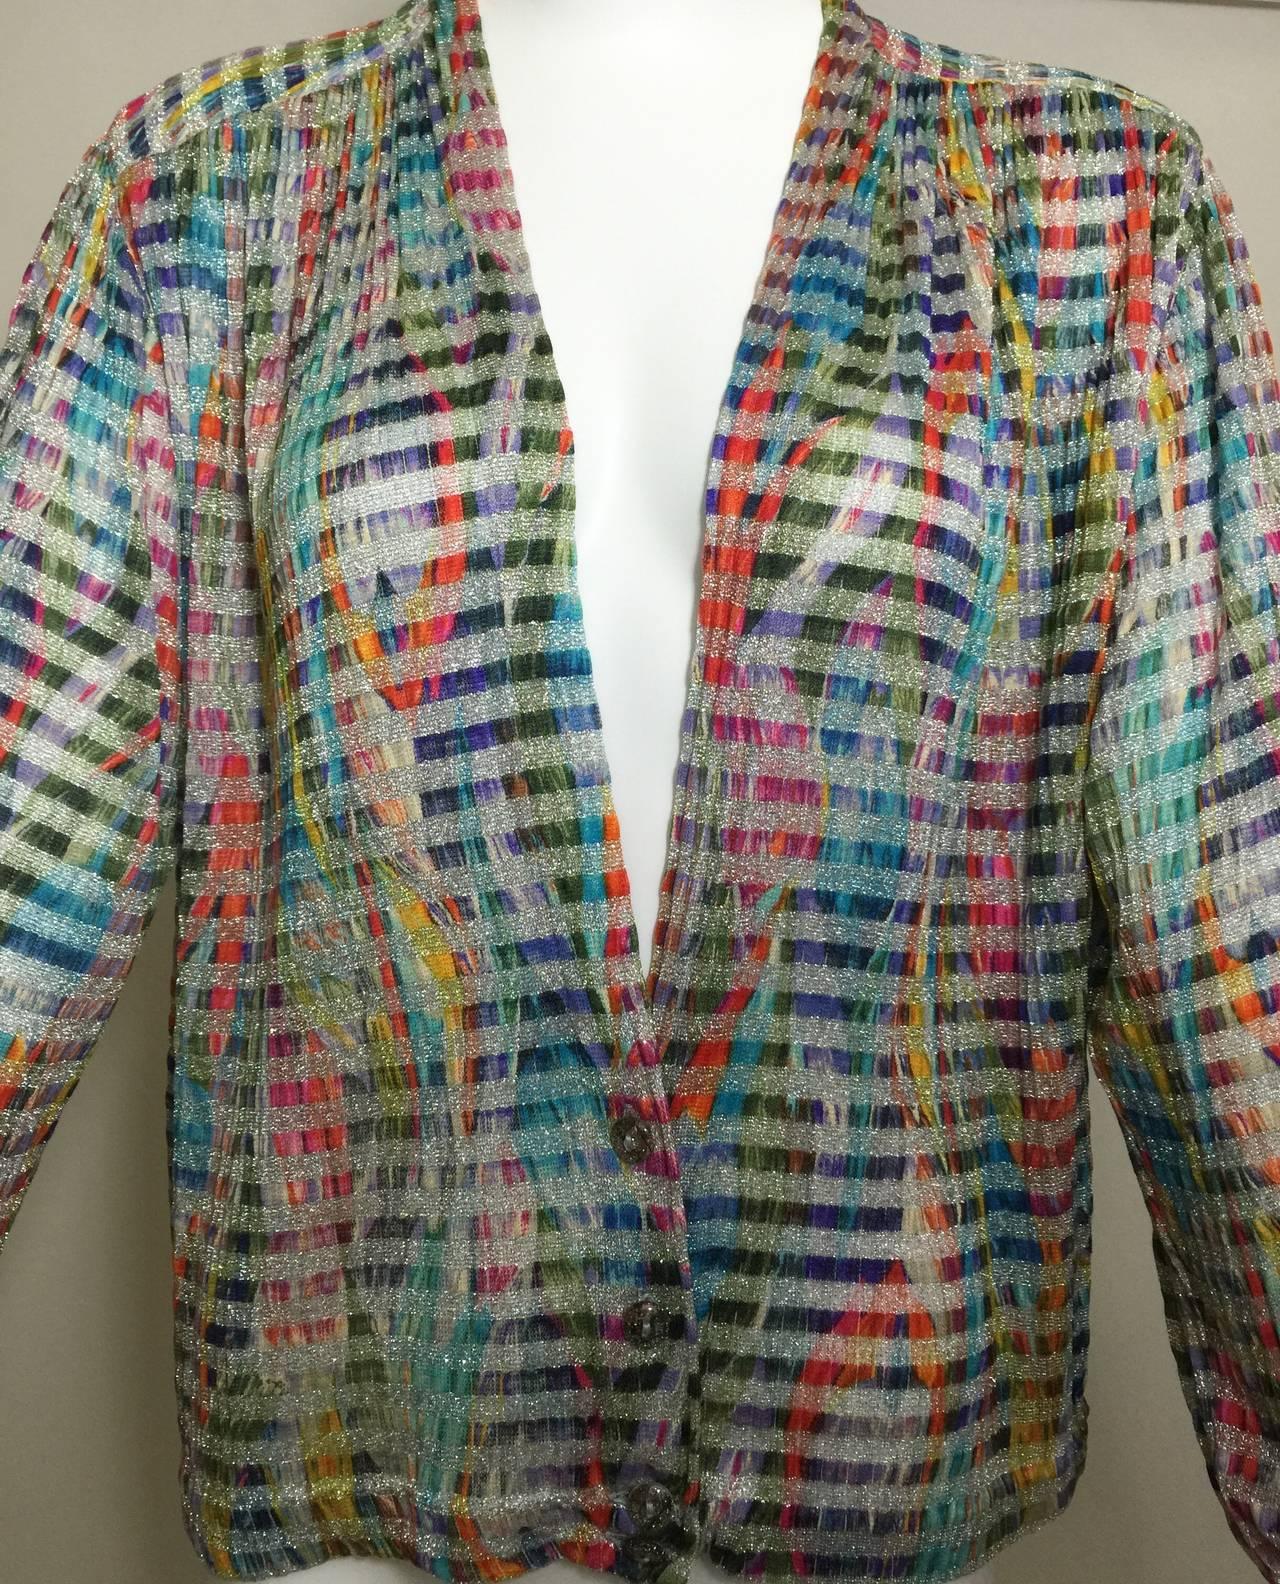 Women's 1970s Missoni Metallic Knit Cardigan Top For Sale